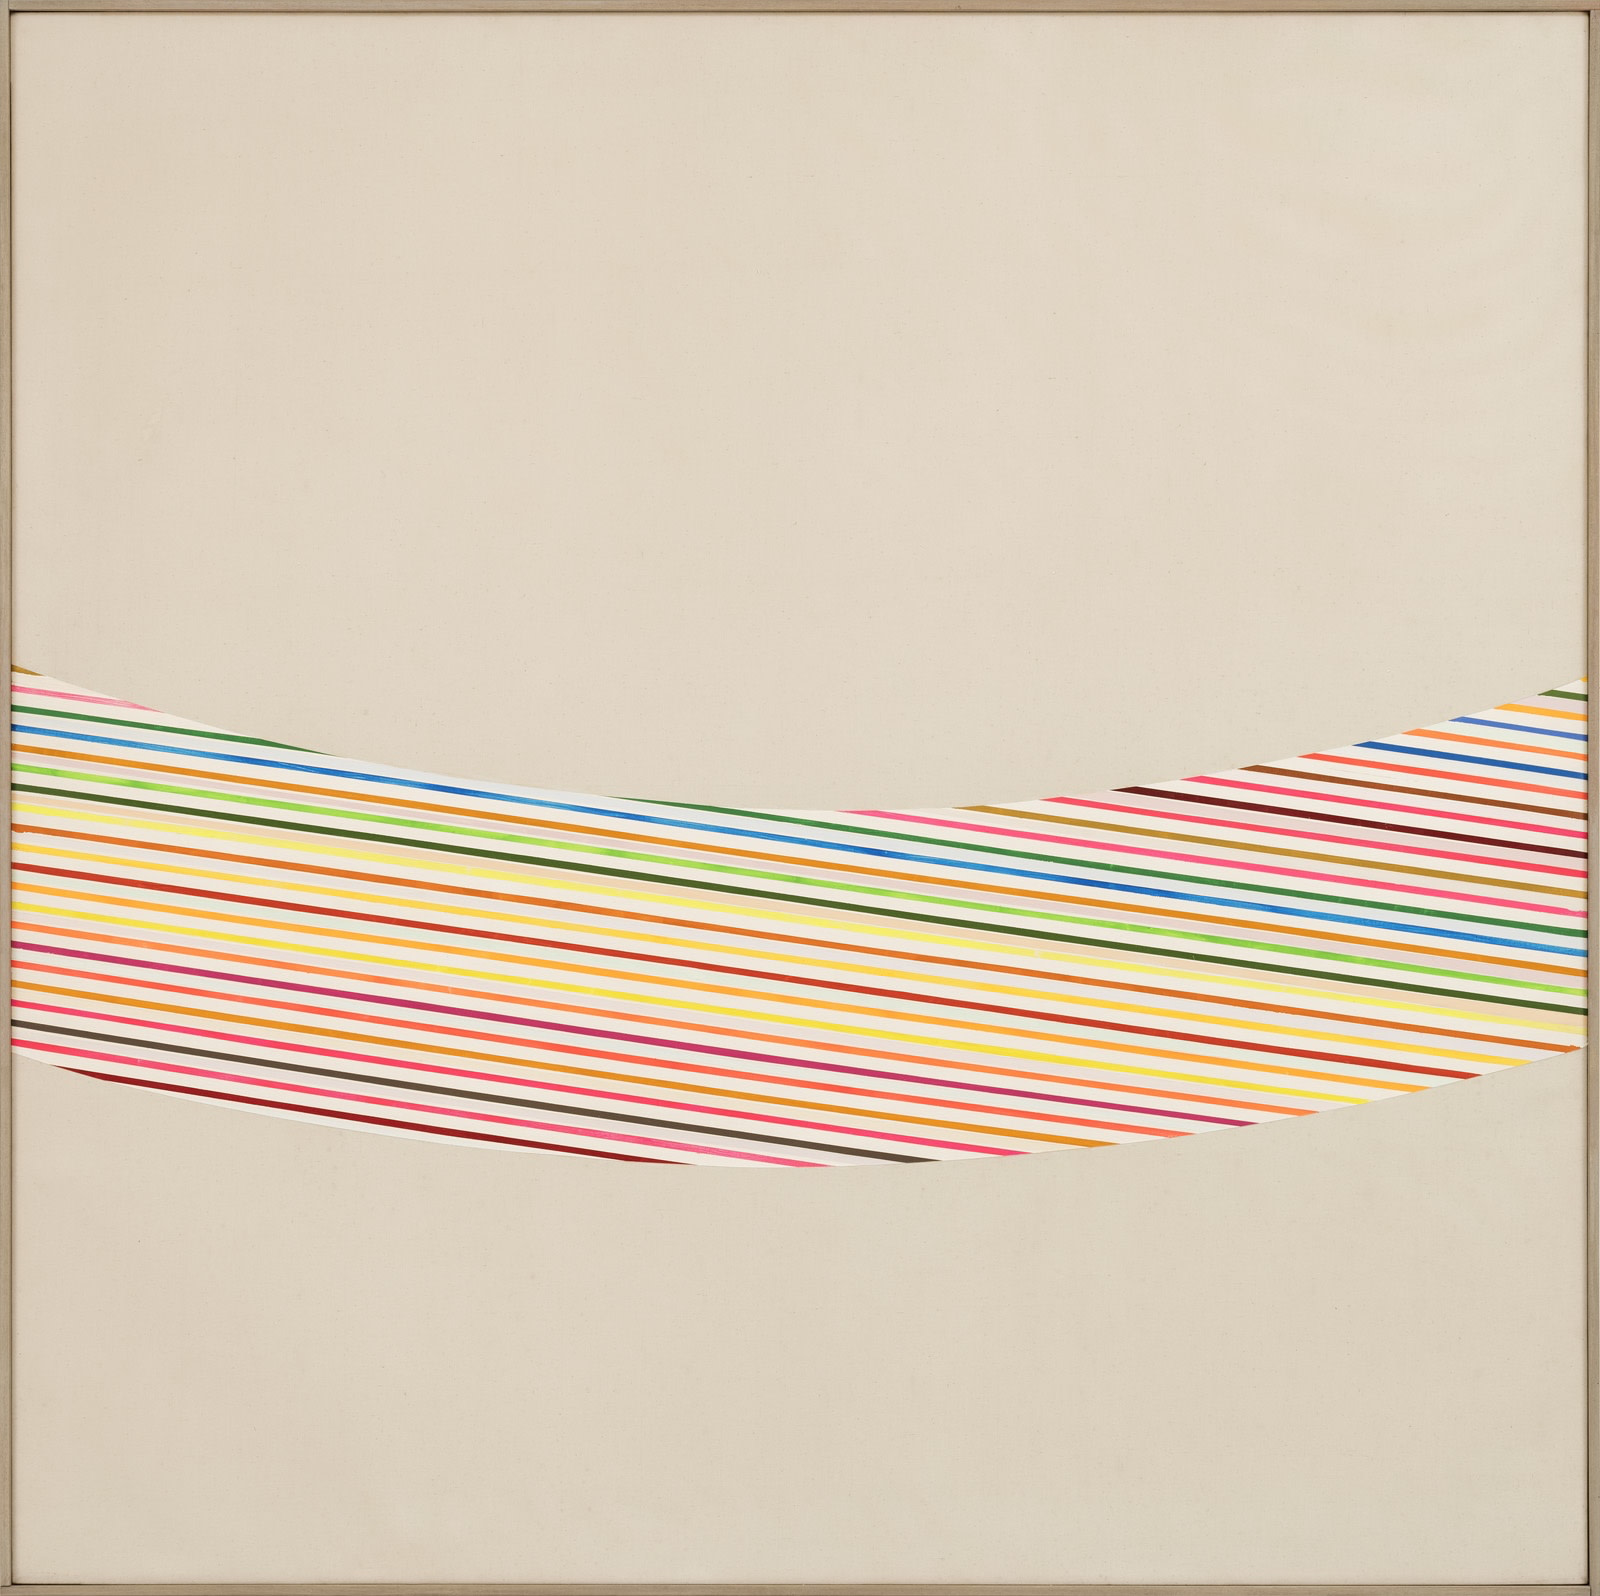 <span class=&#34;link fancybox-details-link&#34;><a href=&#34;/artists/63-john-plumb/works/113/&#34;>View Detail Page</a></span><div class=&#34;artist&#34;><strong>John Plumb</strong></div> 1927-2008 <div class=&#34;title&#34;><em>Colour Planes</em></div> <div class=&#34;signed_and_dated&#34;>signed and dated 1971 verso</div> <div class=&#34;medium&#34;>acrylic on cotton duck</div> <div class=&#34;dimensions&#34;>152.5 x 152.5 cms (60 x 60 ins)<br /> framed: 155 x 155 cms (61 x 61 ins) </div>